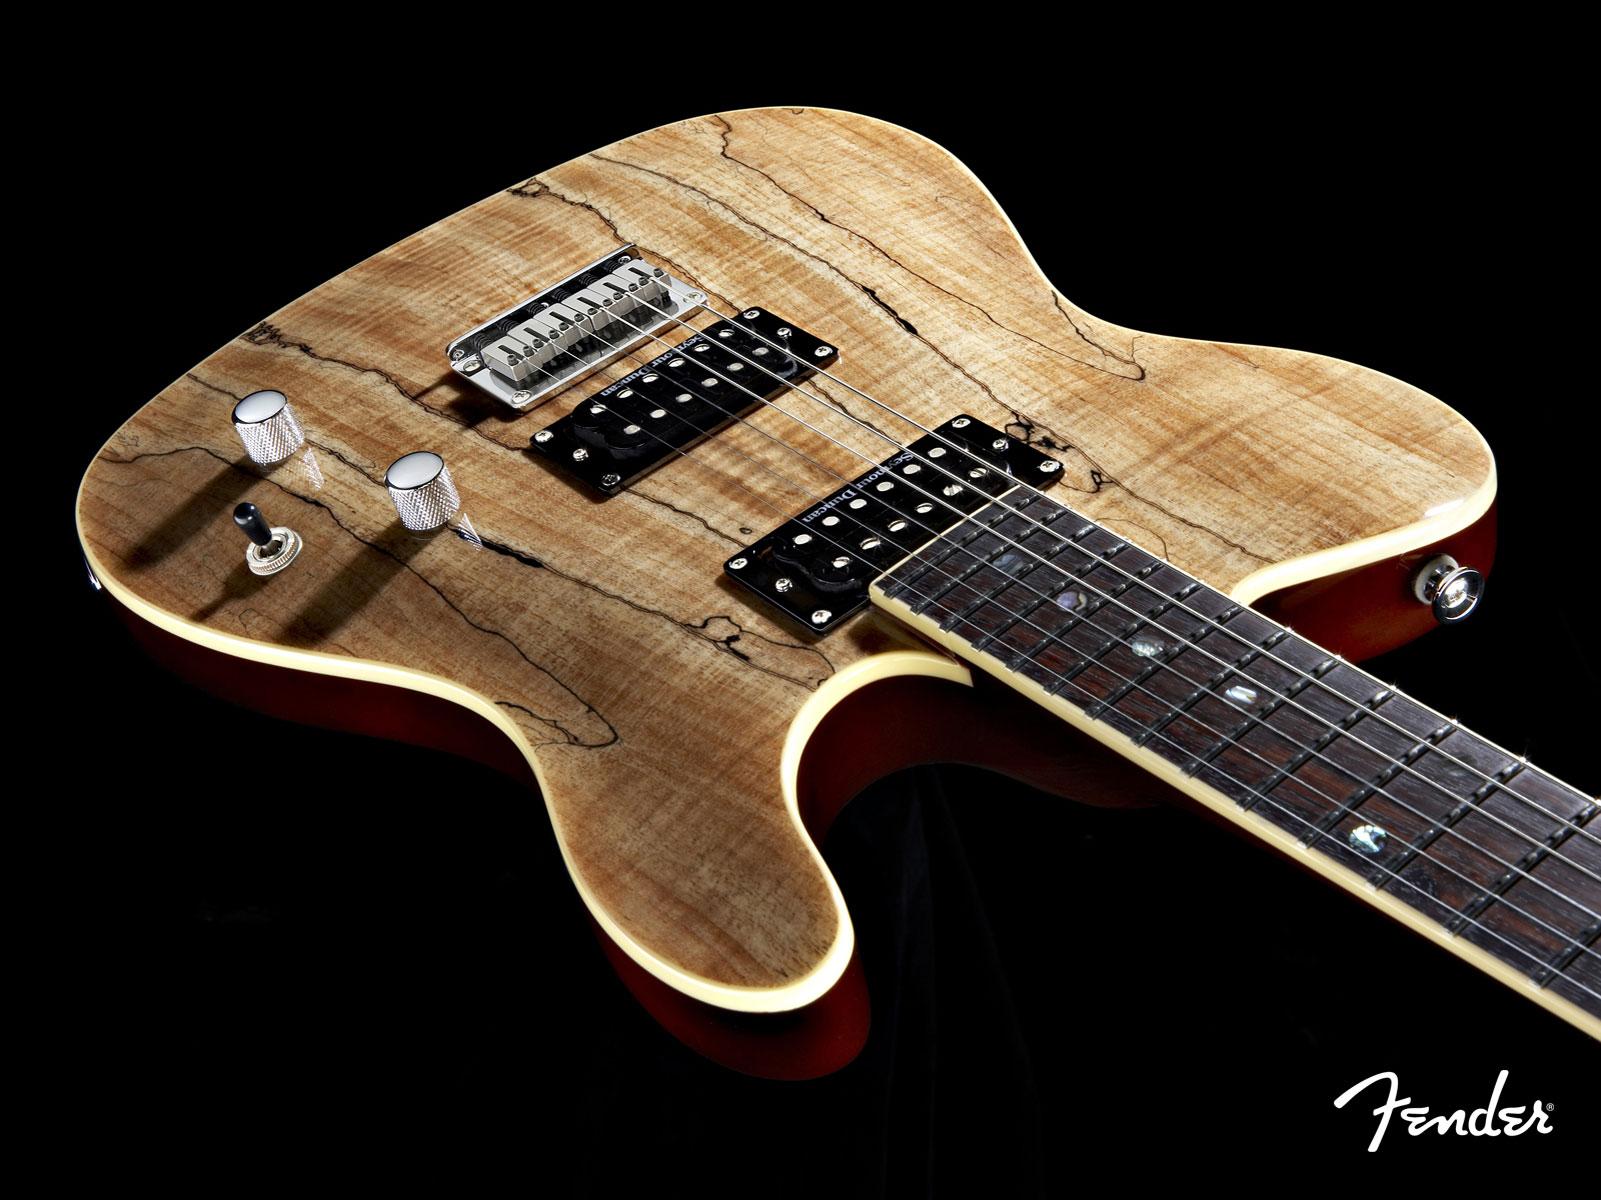 Guitare Fond d'écran and Arrière-Plan   1601x1200   ID:586672 - Wallpaper Abyss